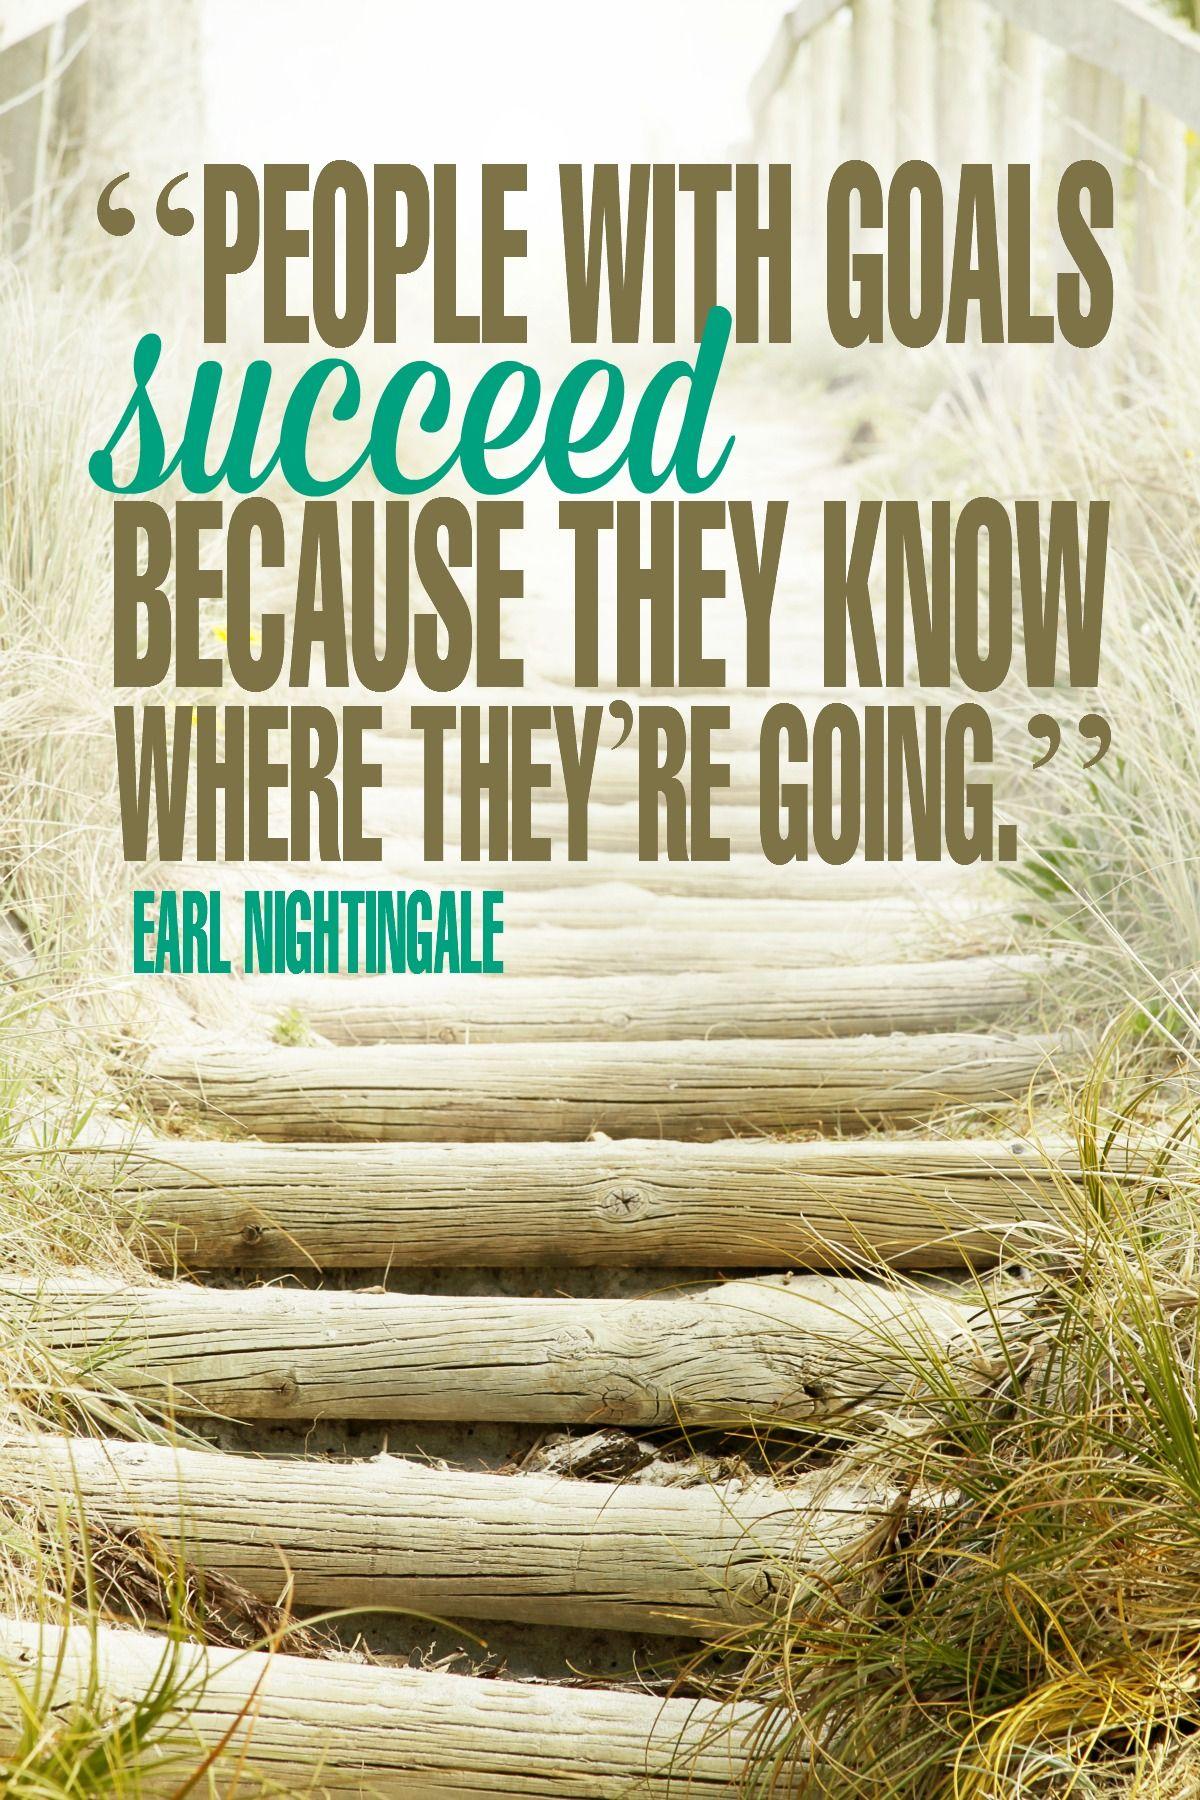 Inspirational Goal Quotes 17 Inspiring Quotes about Goals   Quotes   Inspirational Quotes  Inspirational Goal Quotes